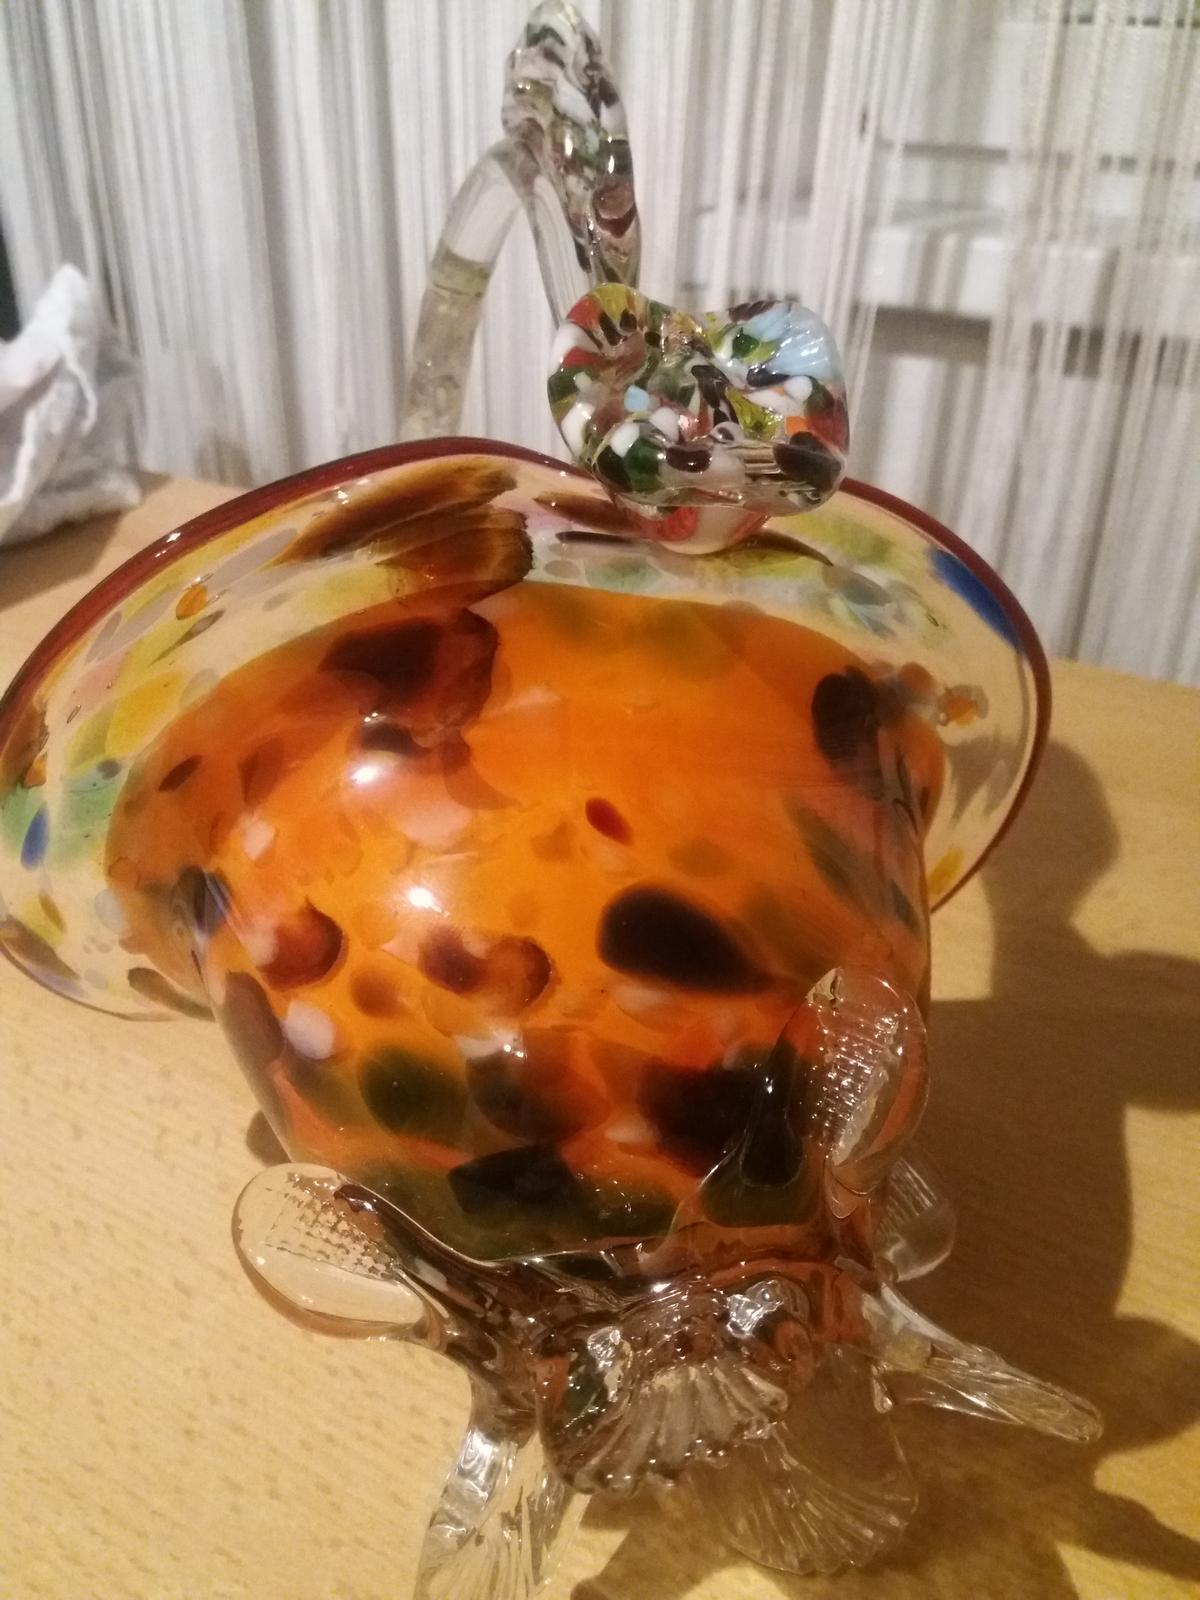 Rucne skleneny fukany kosik - Obrázok č. 1